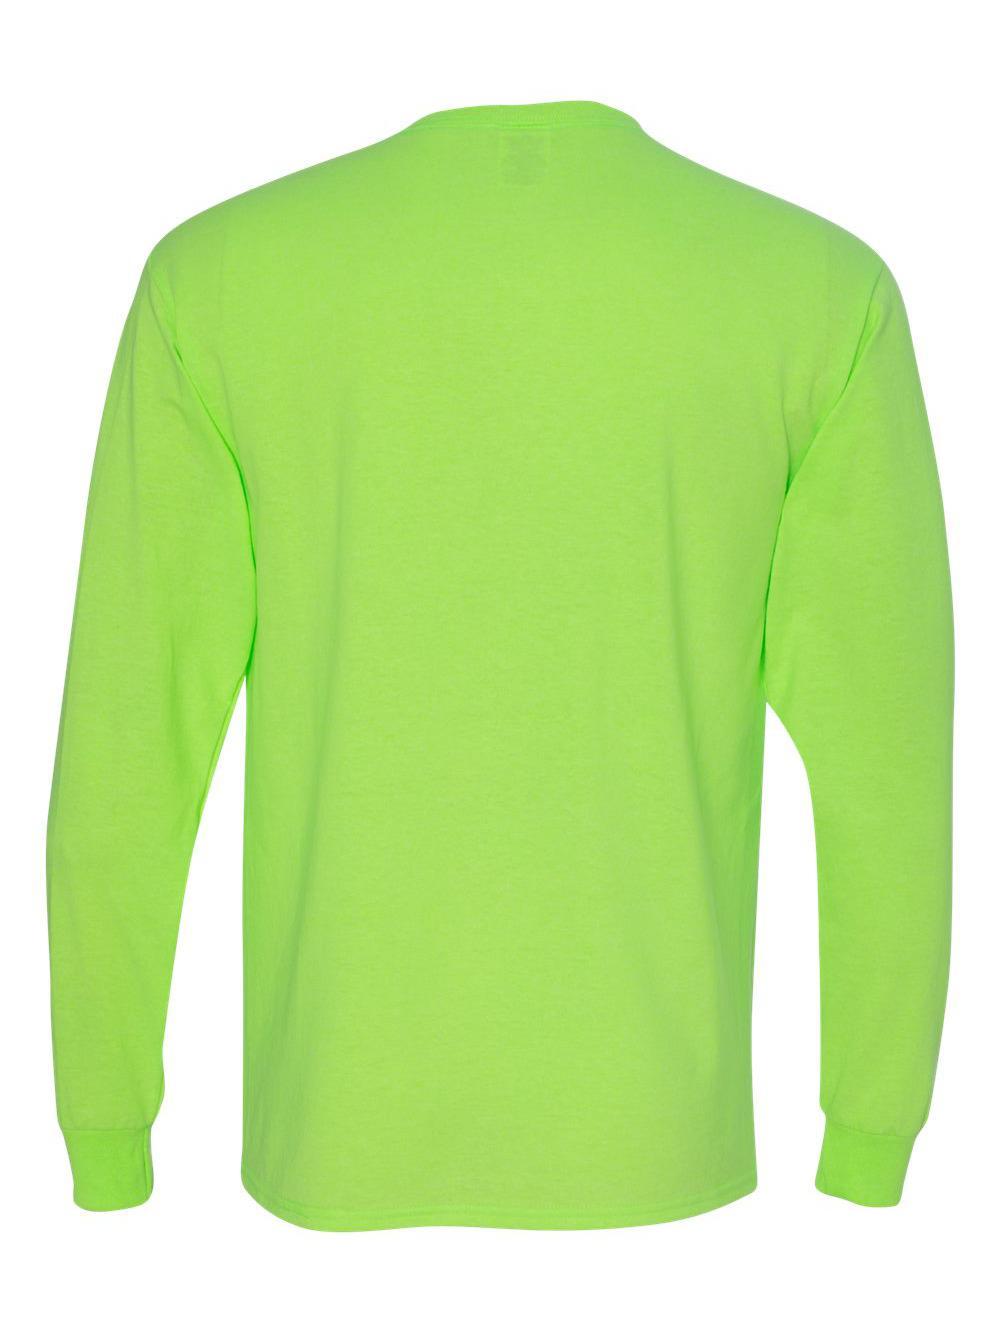 Jerzees-Dri-Power-Long-Sleeve-50-50-T-Shirt-29LSR thumbnail 61